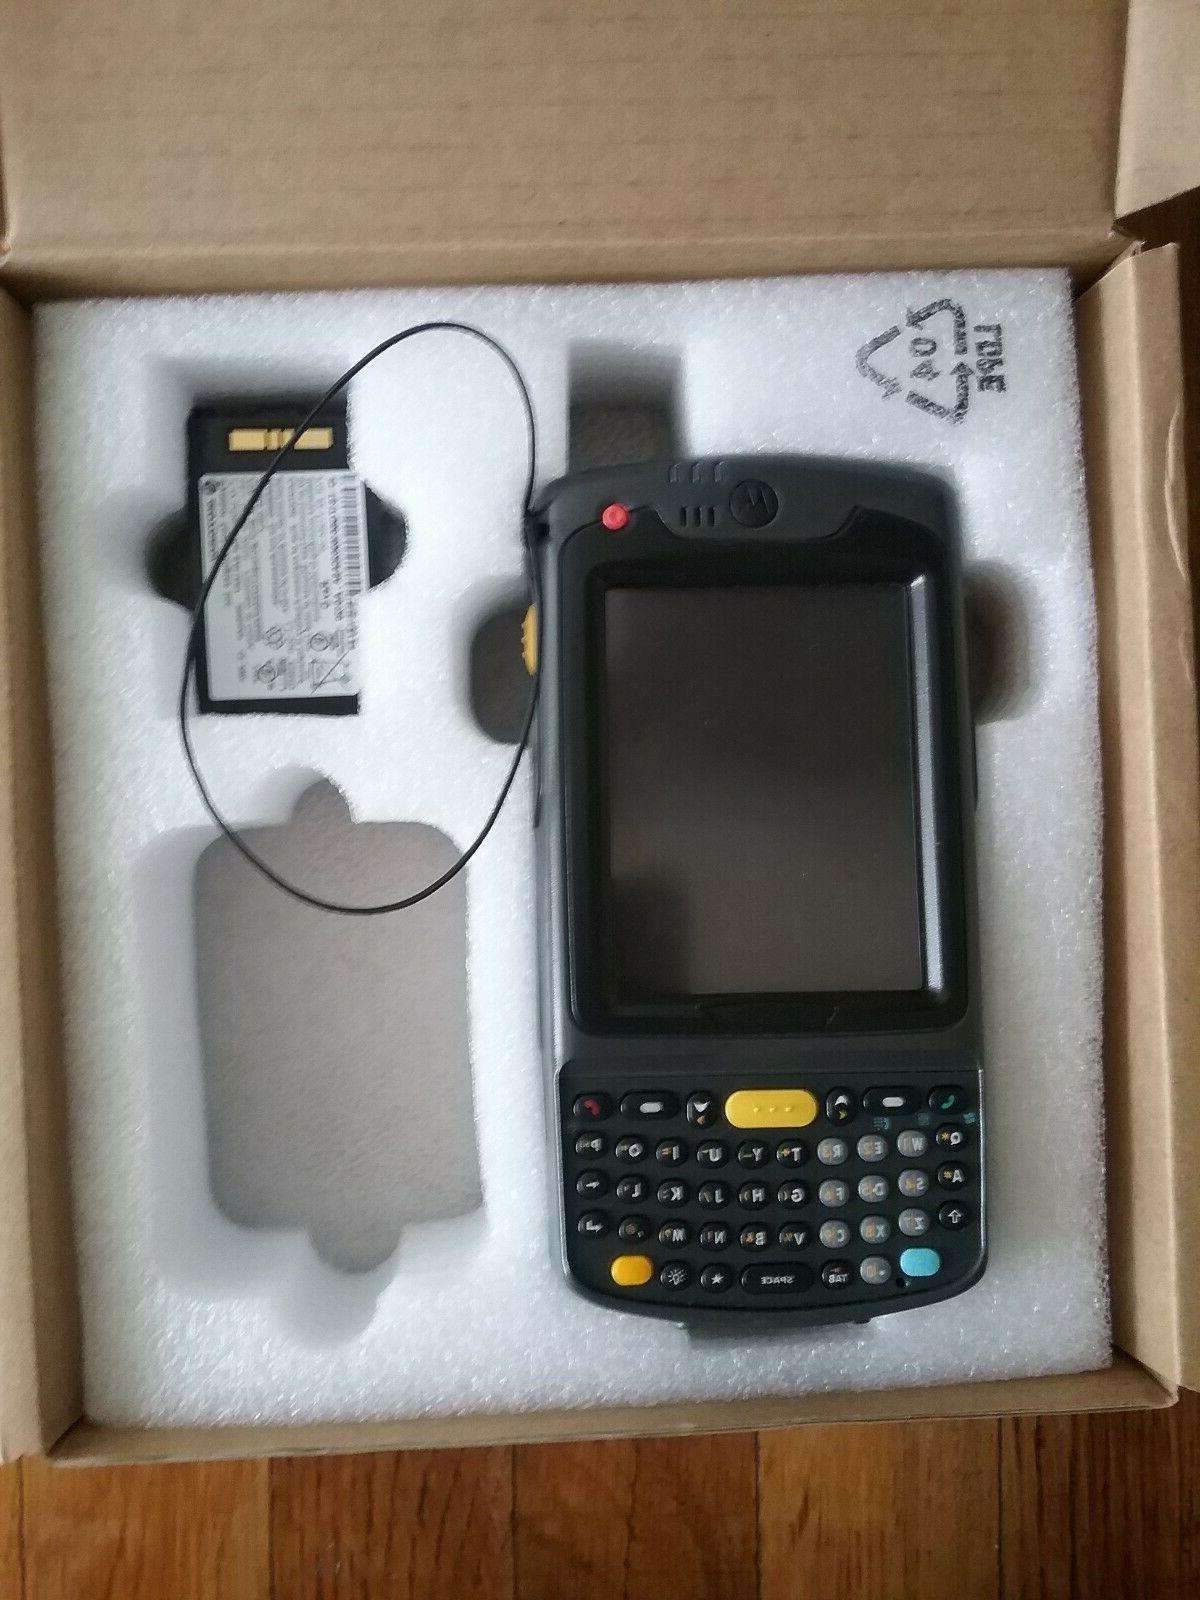 mc7090 mobile handheld computer barcode scanner w